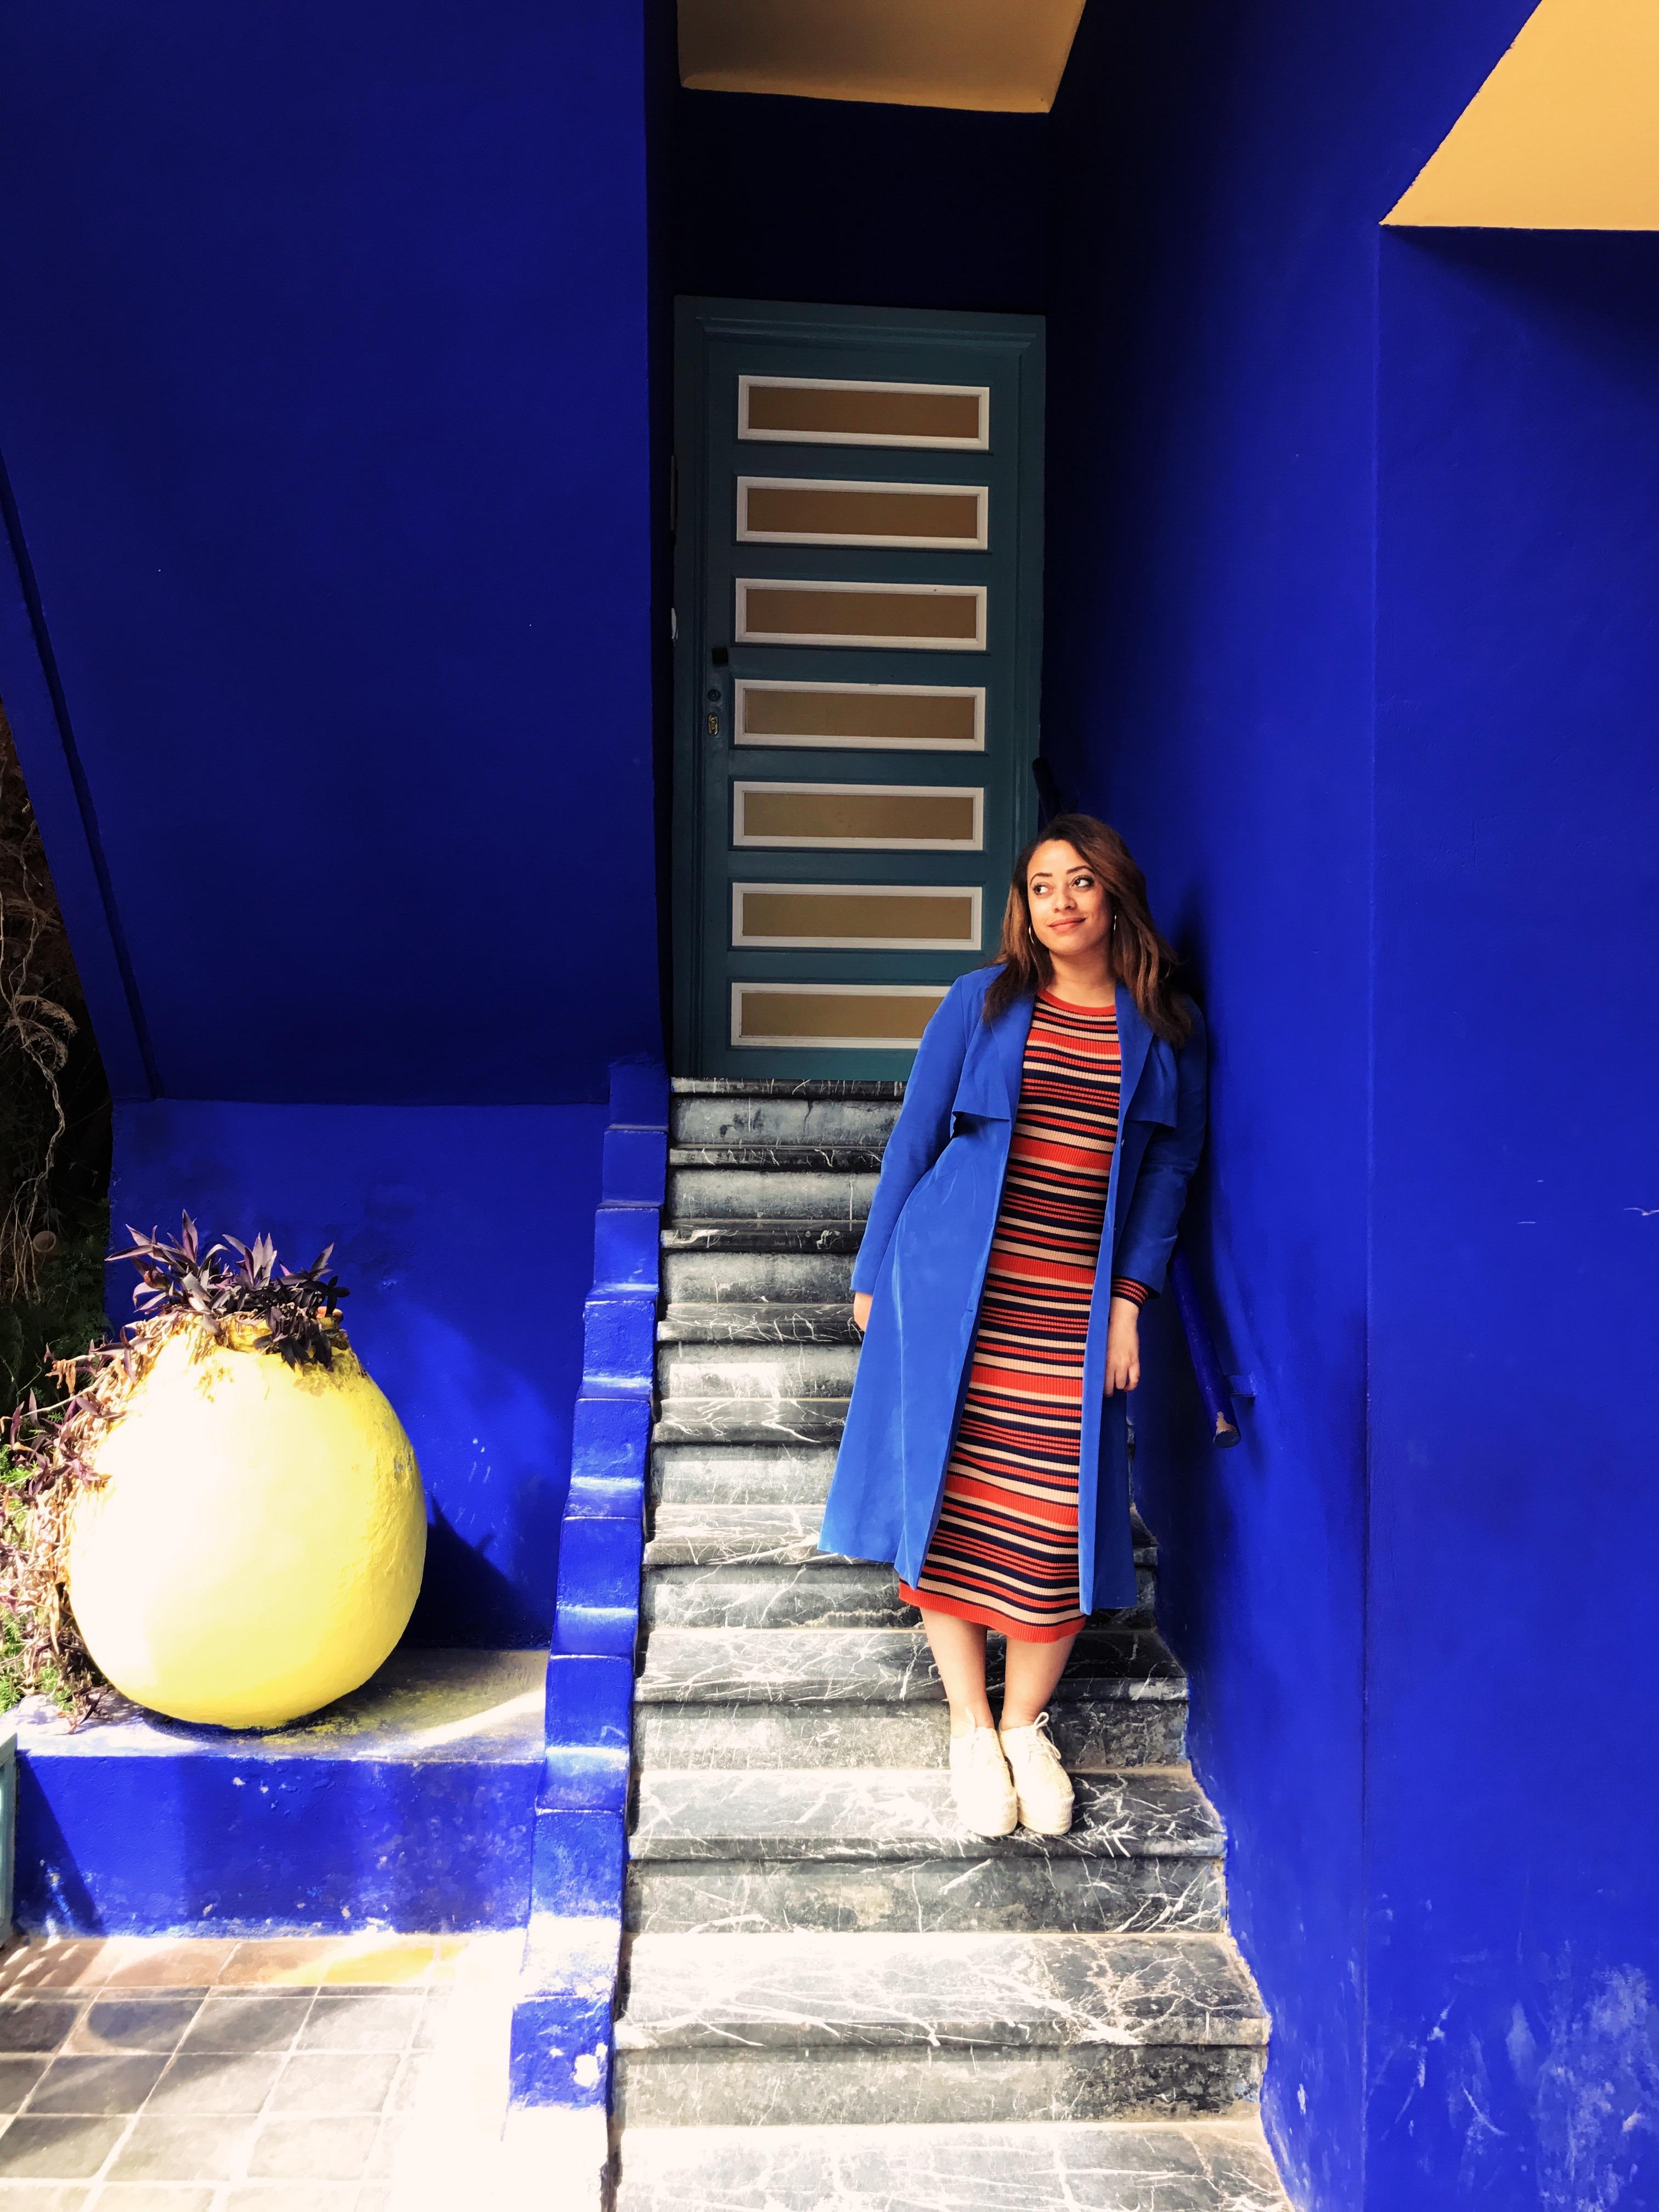 Jardin Majorelle - Marrakech - stripes - flowers- tile